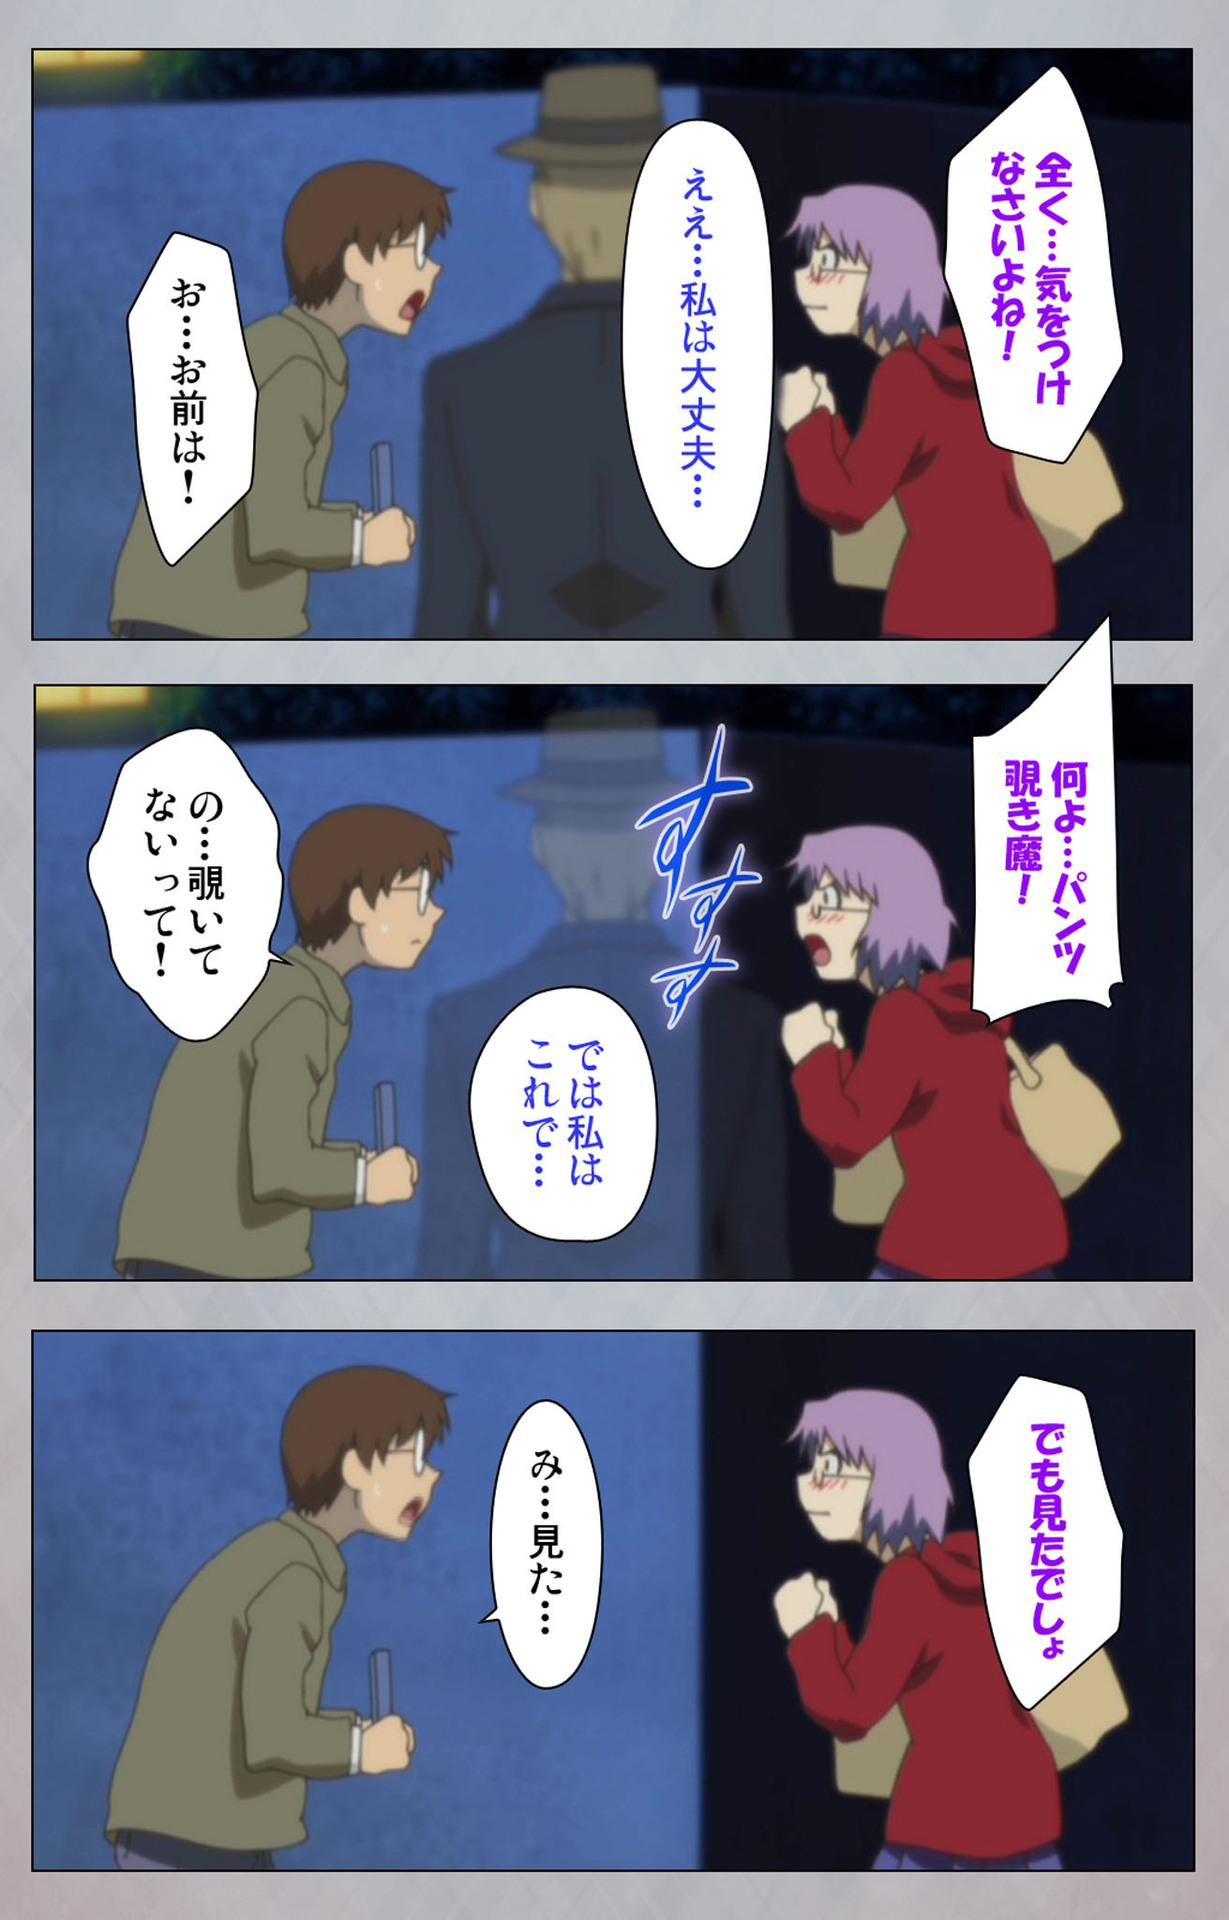 [Digital Works] [Full Color Seijin Ban] Sex Android ~Risou no Onna de Nuite yaru~ Kanzenban 23